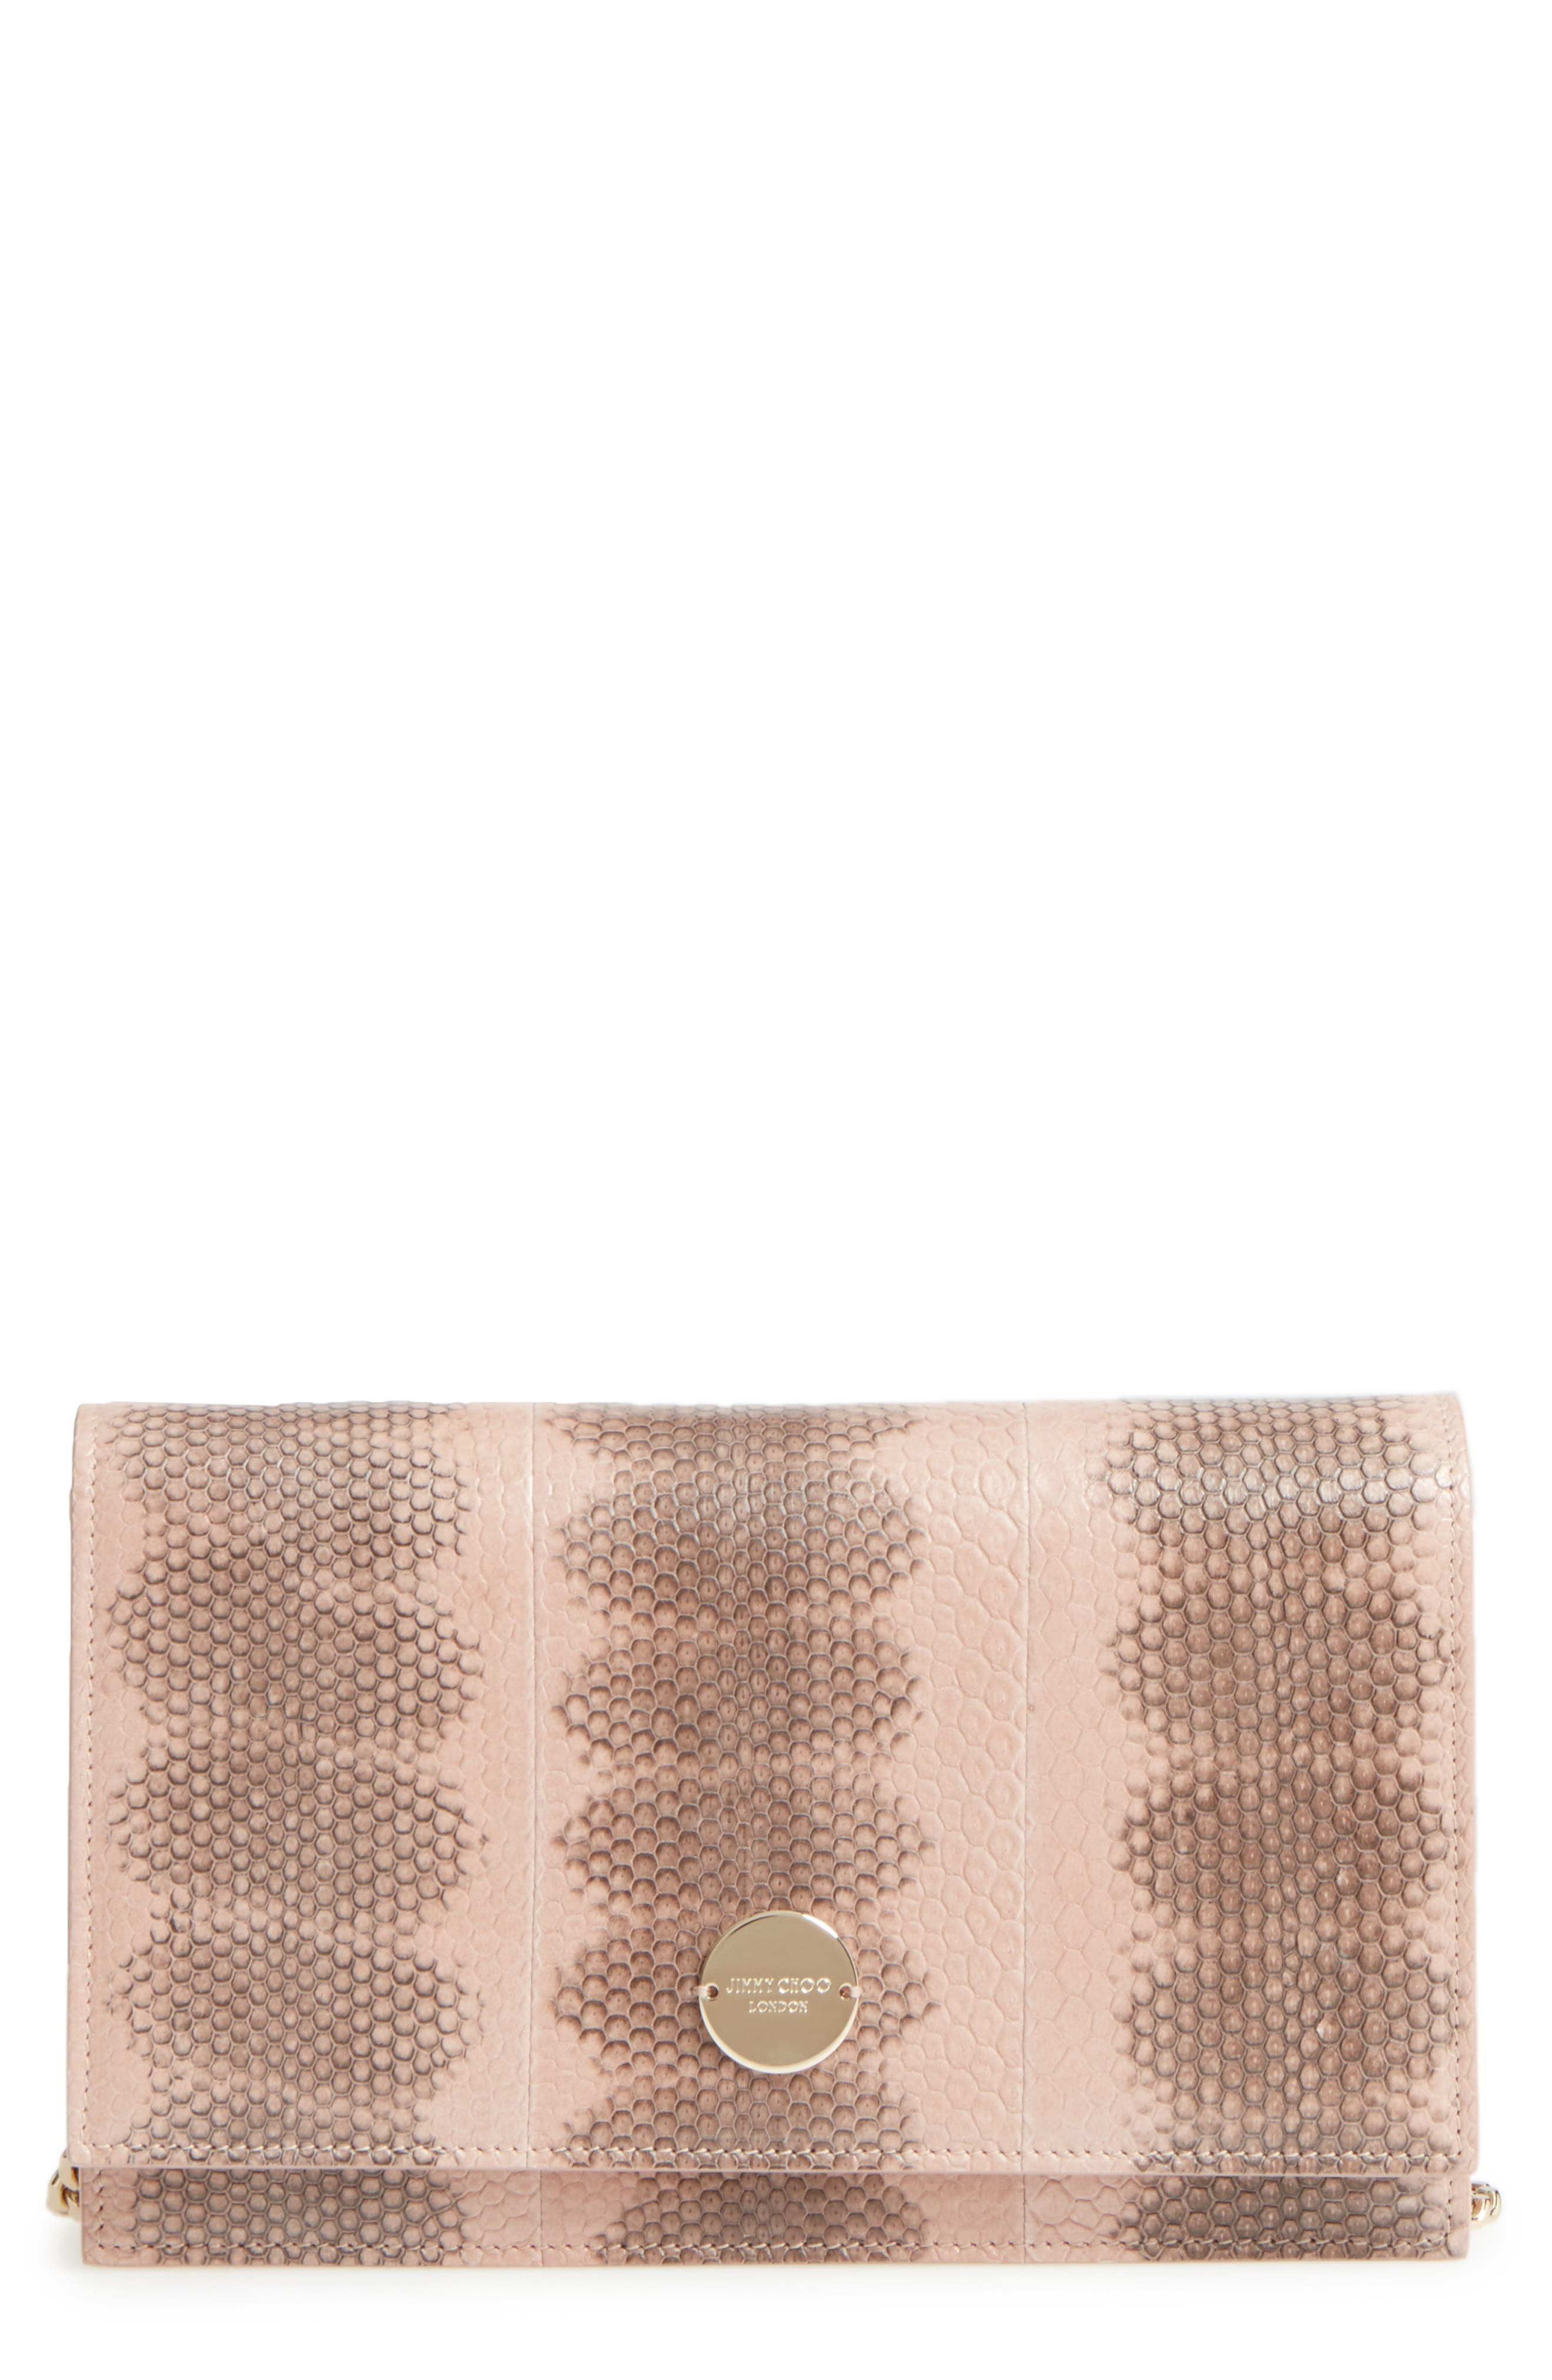 Alternate Image 1 Selected - Jimmy Choo Florence Genuine Snakeskin Crossbody Bag